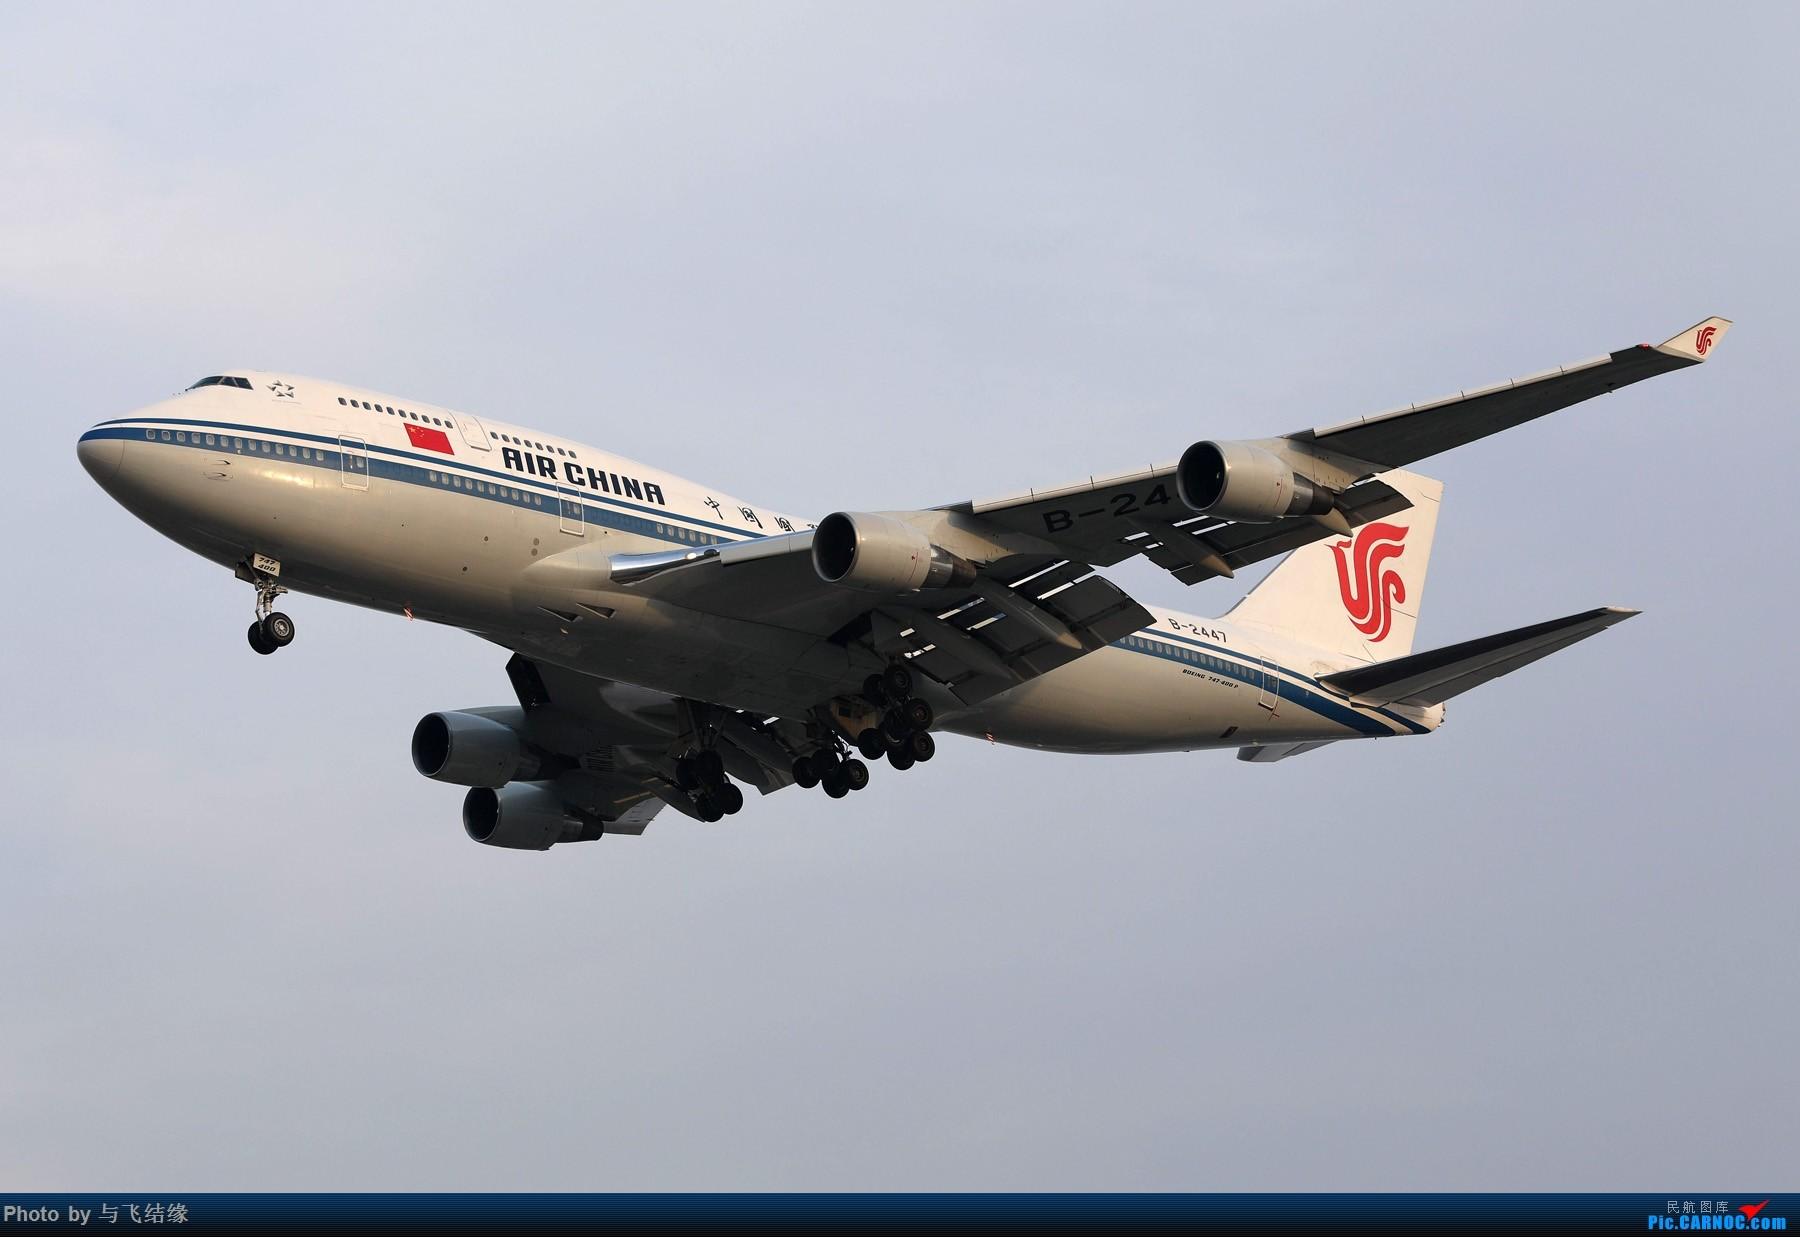 Re:中国国际航空Boeing 747-400,B-2447. BOEING 747-400 B-2447 中国北京首都国际机场